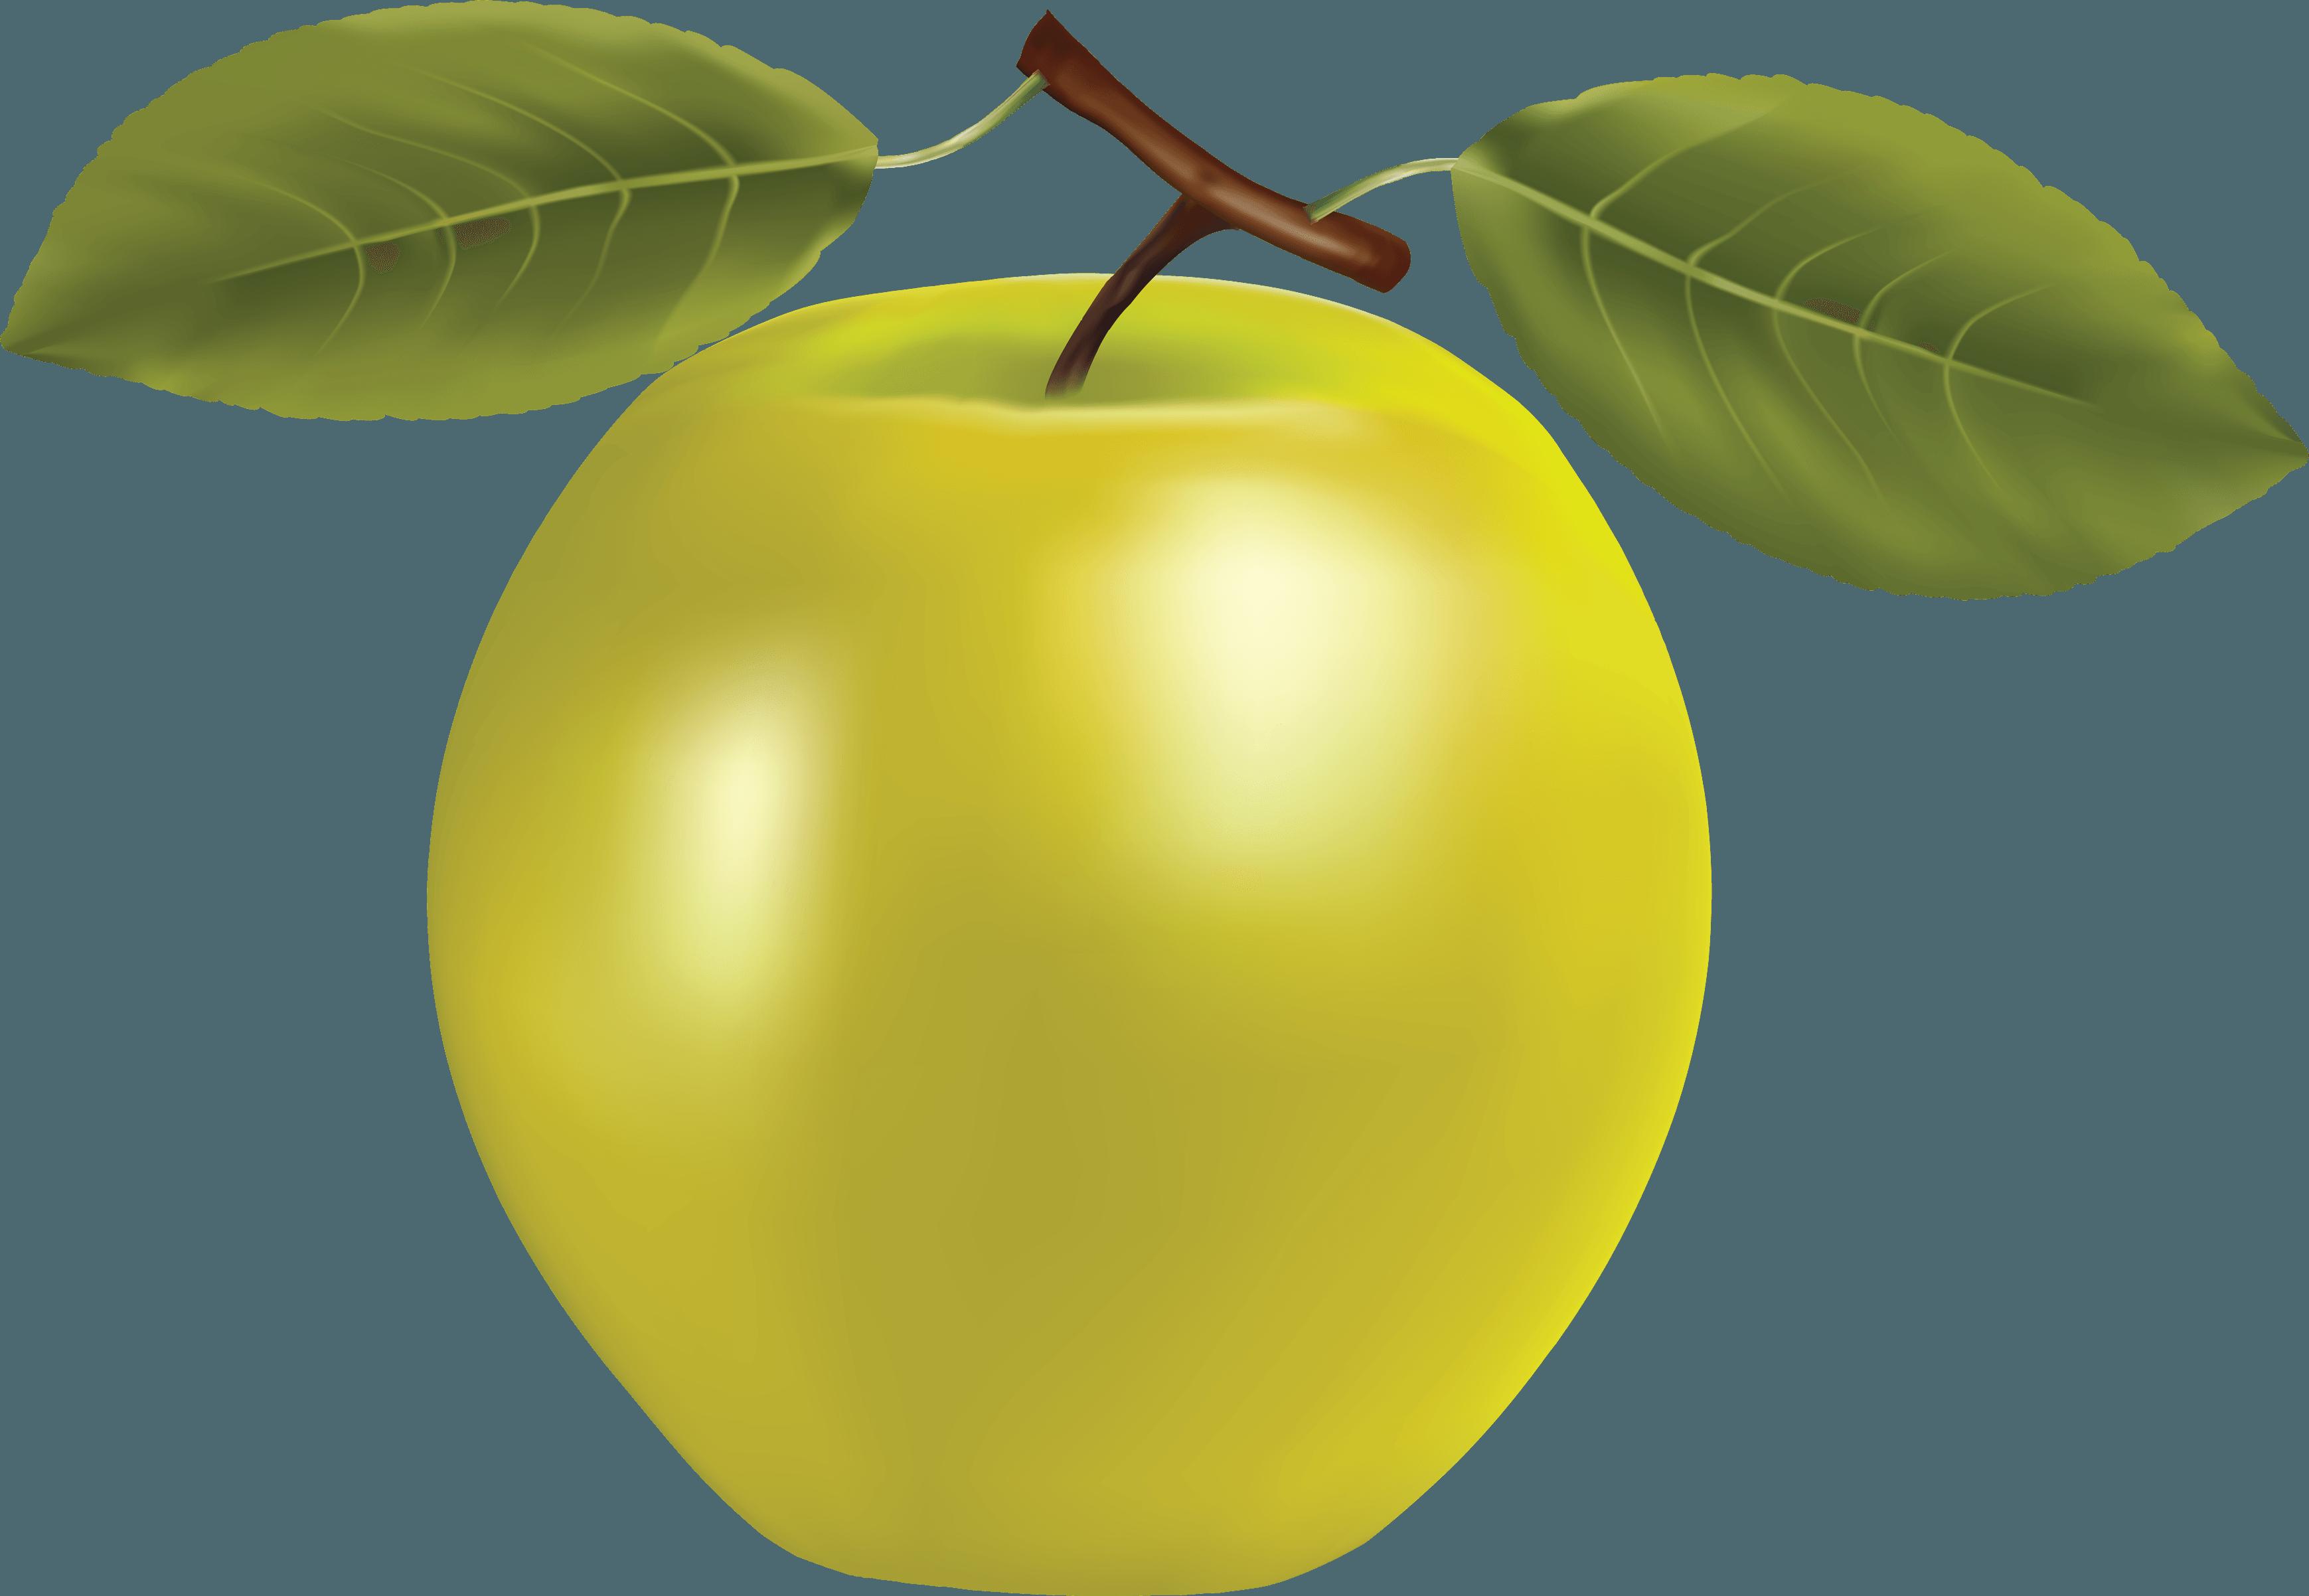 png apple image. 5 clipart transparent